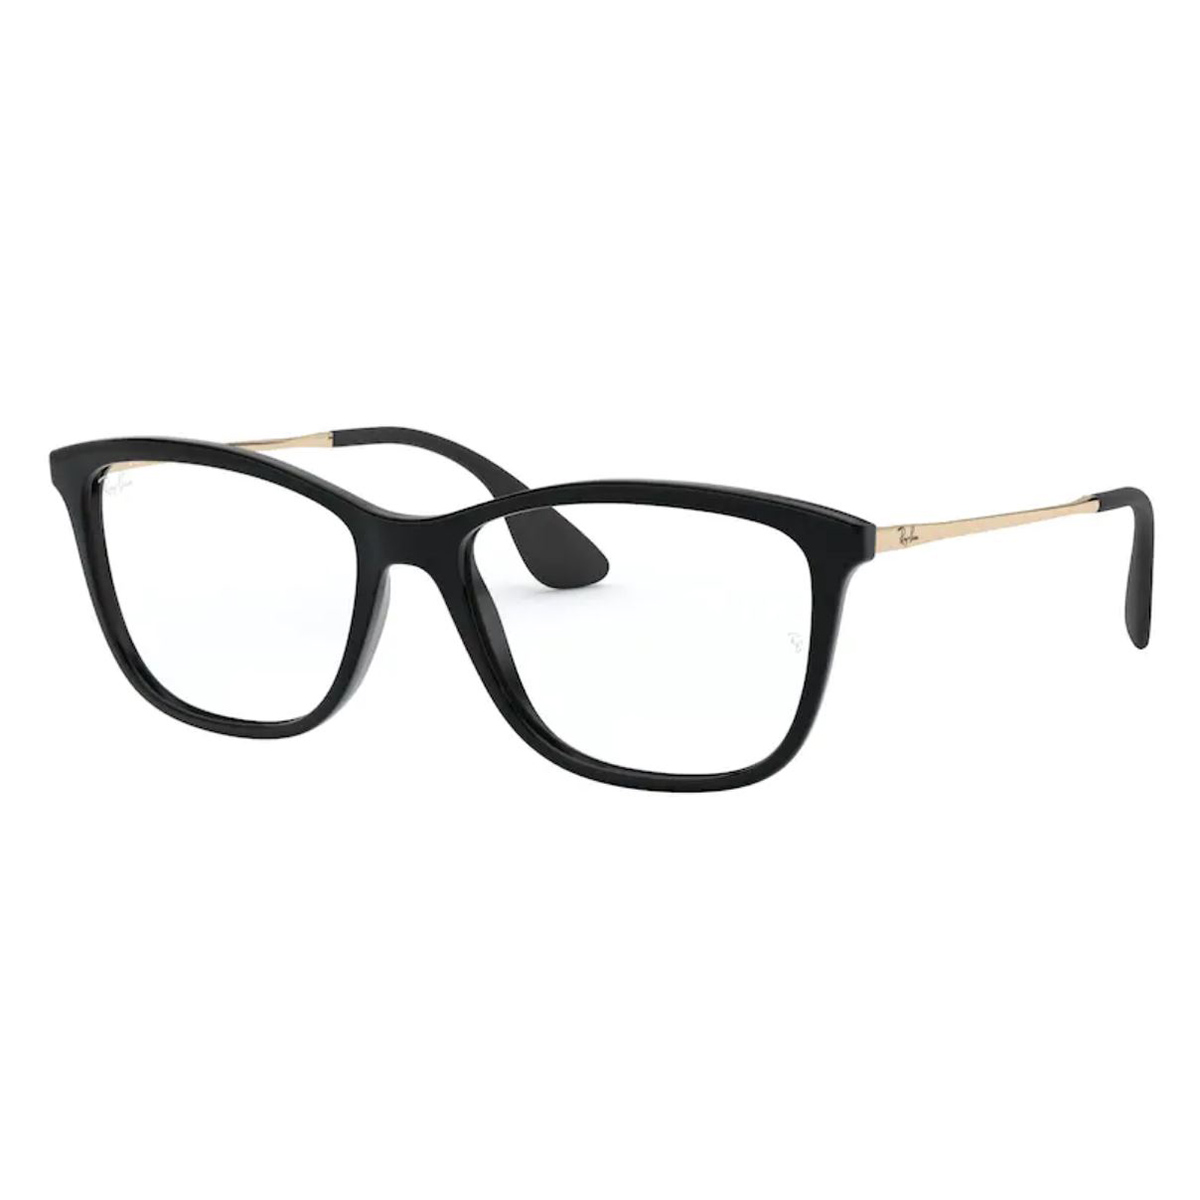 Óculos de Grau Ray Ban RX7135L Preto Brilho Tamanho 54